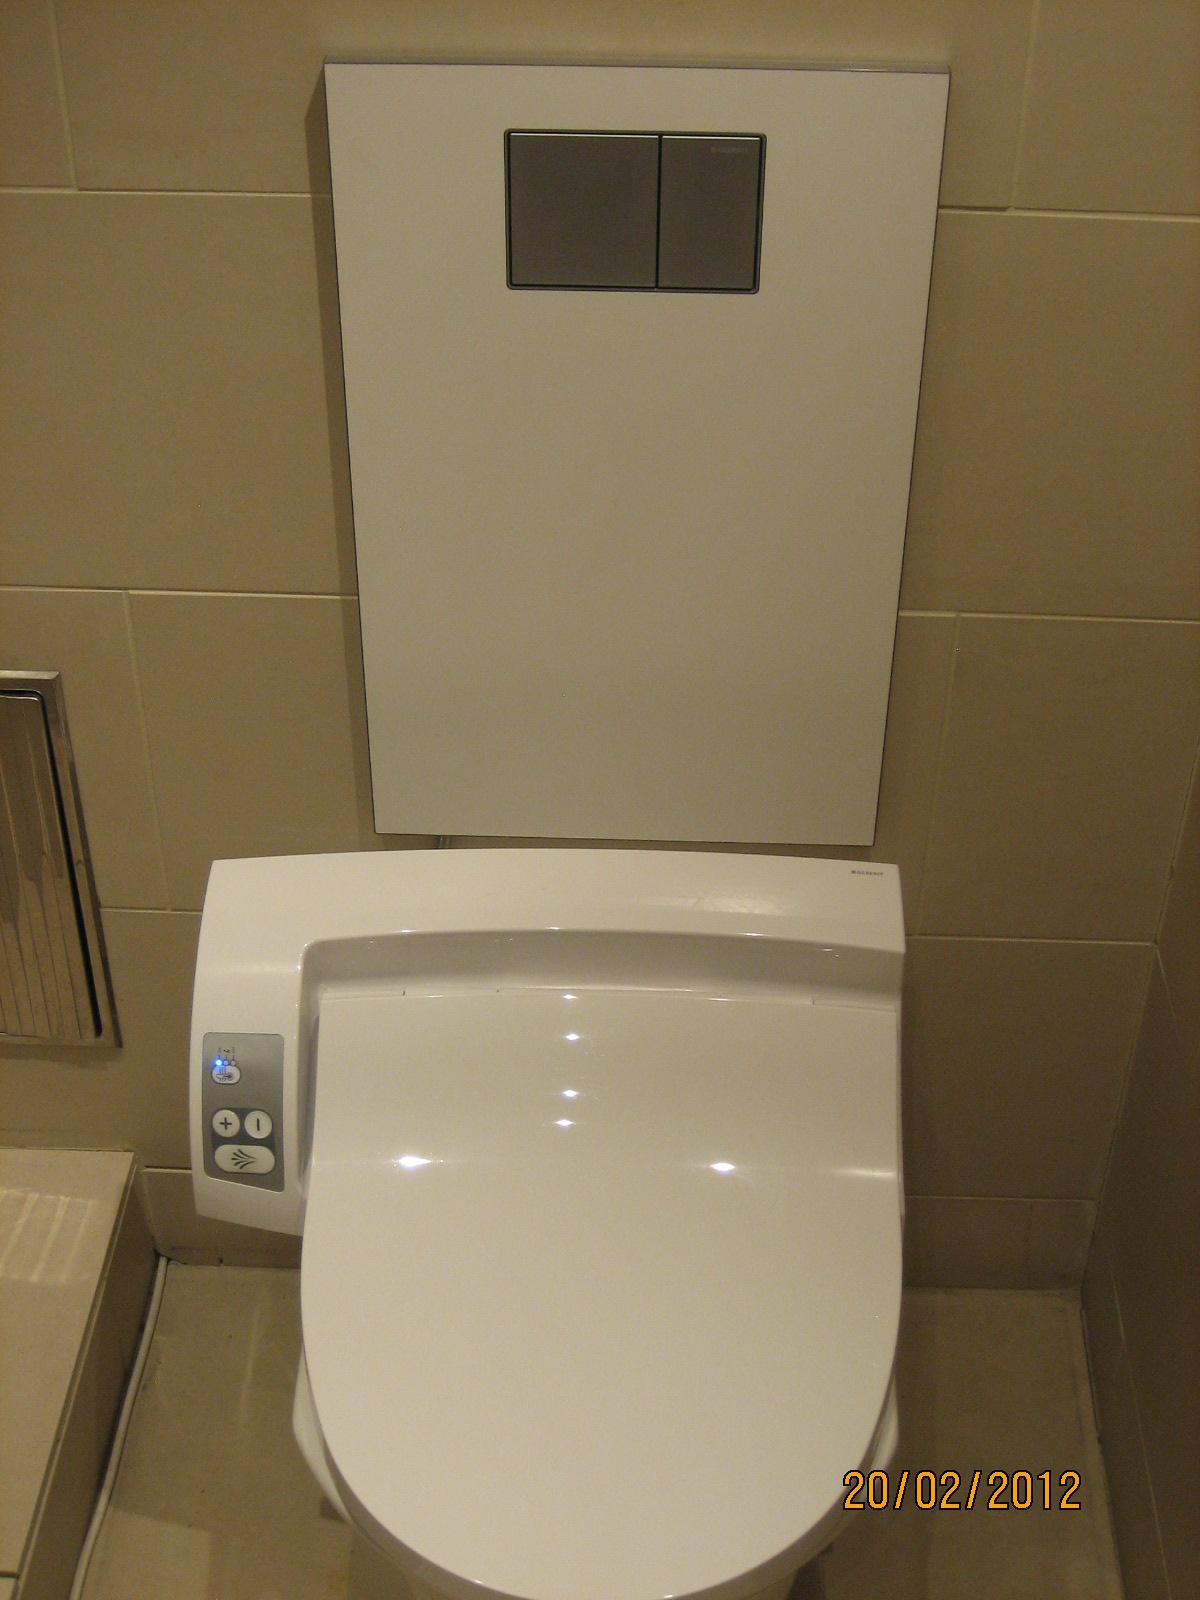 geberit aquaclean toilet bidet combo seat on display in barnet bathroom trading barnet. Black Bedroom Furniture Sets. Home Design Ideas